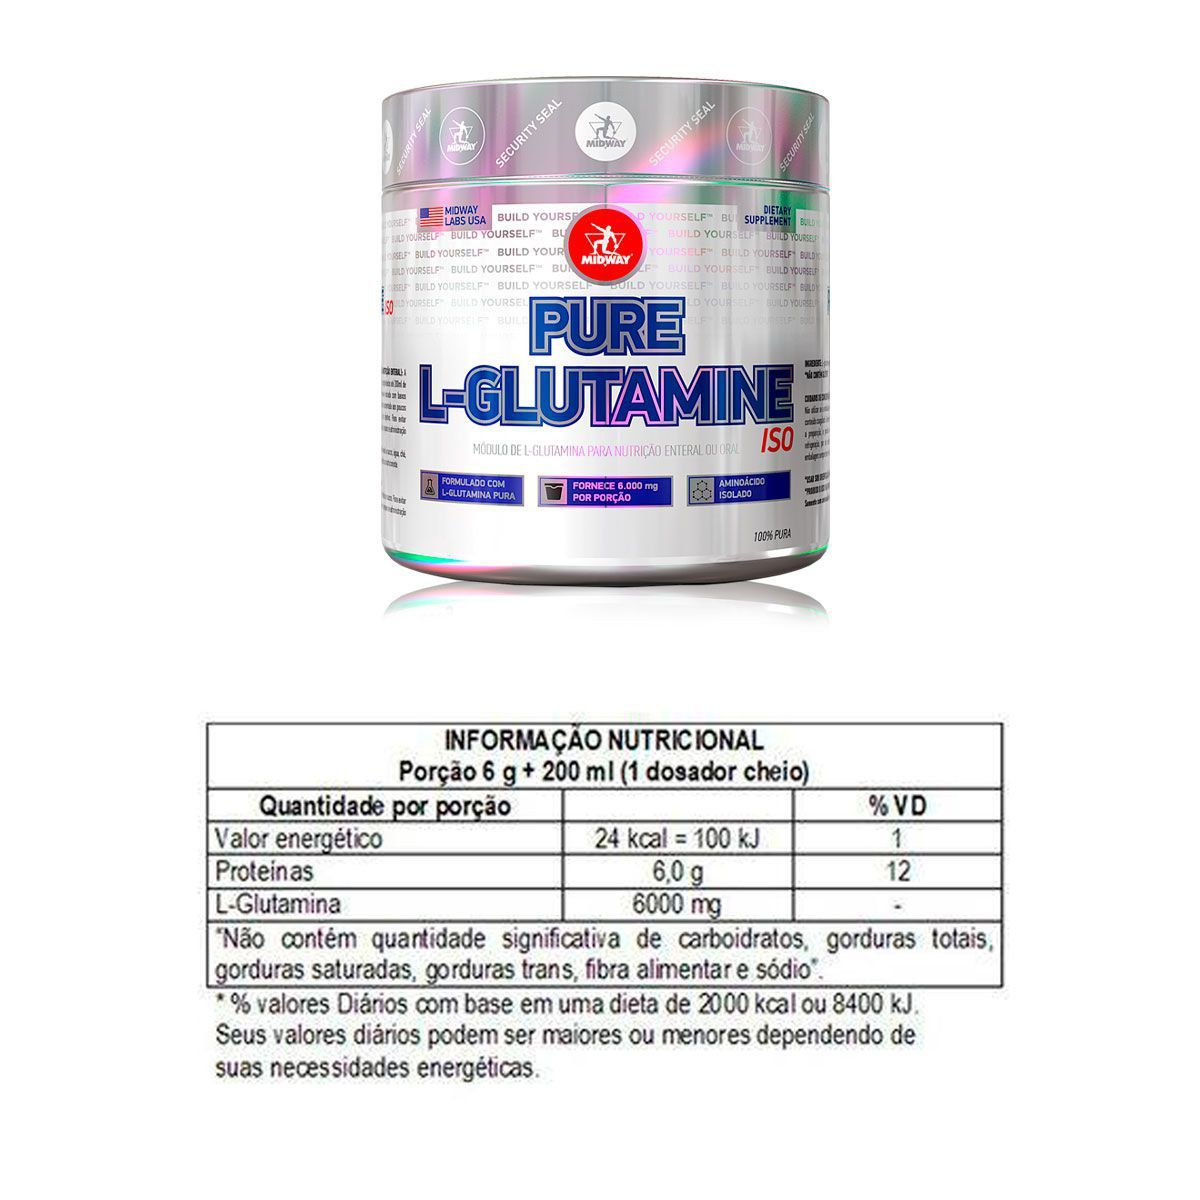 Kit Whey Protein 1kg + L-Glutamina Powder + bcaa Vit + Coq - Midway